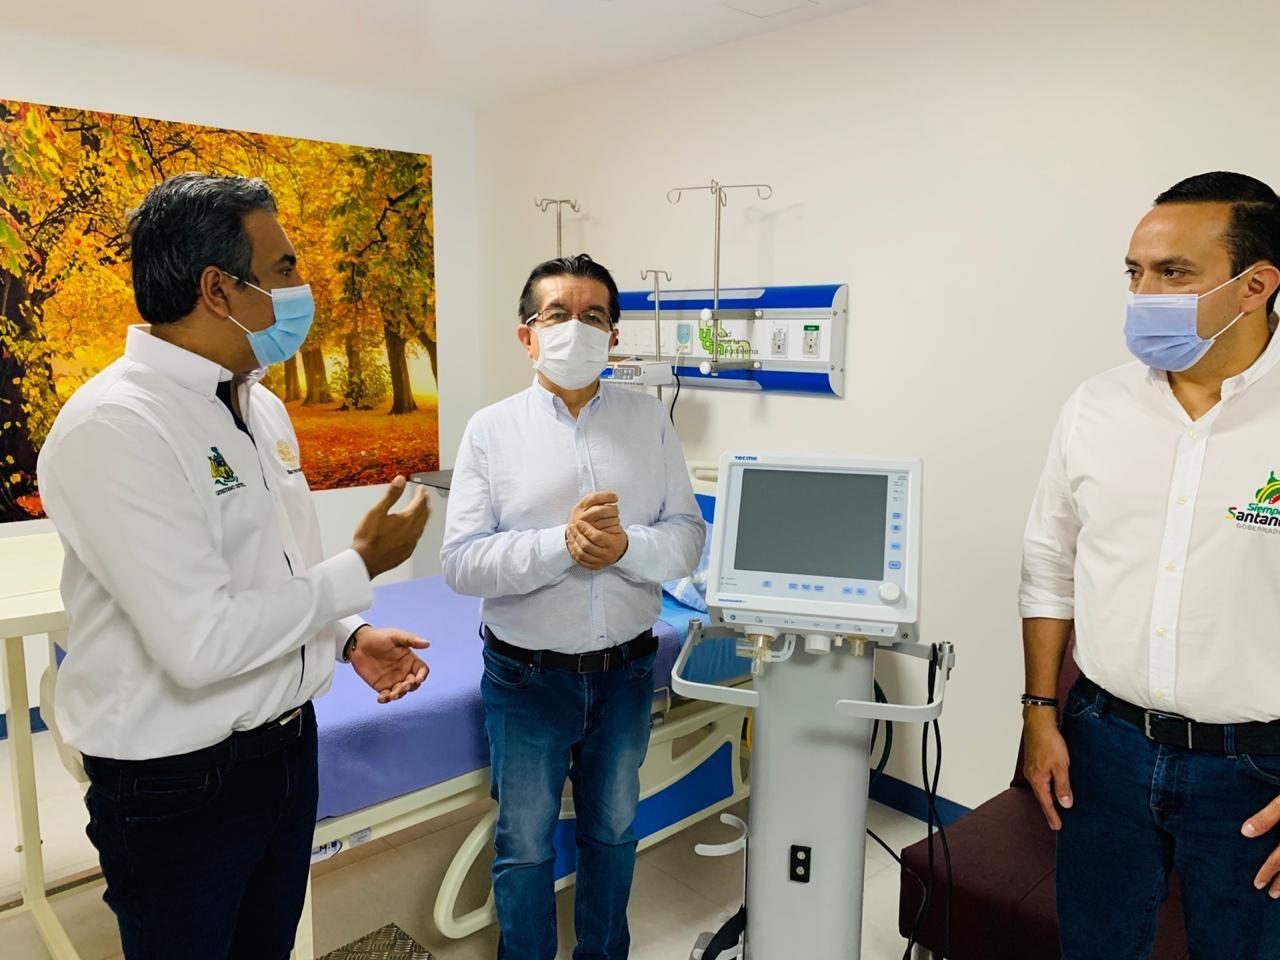 Minsalud entregó 10 respiradores mecánicos en Barrancabermeja  | Política | EL FRENTE